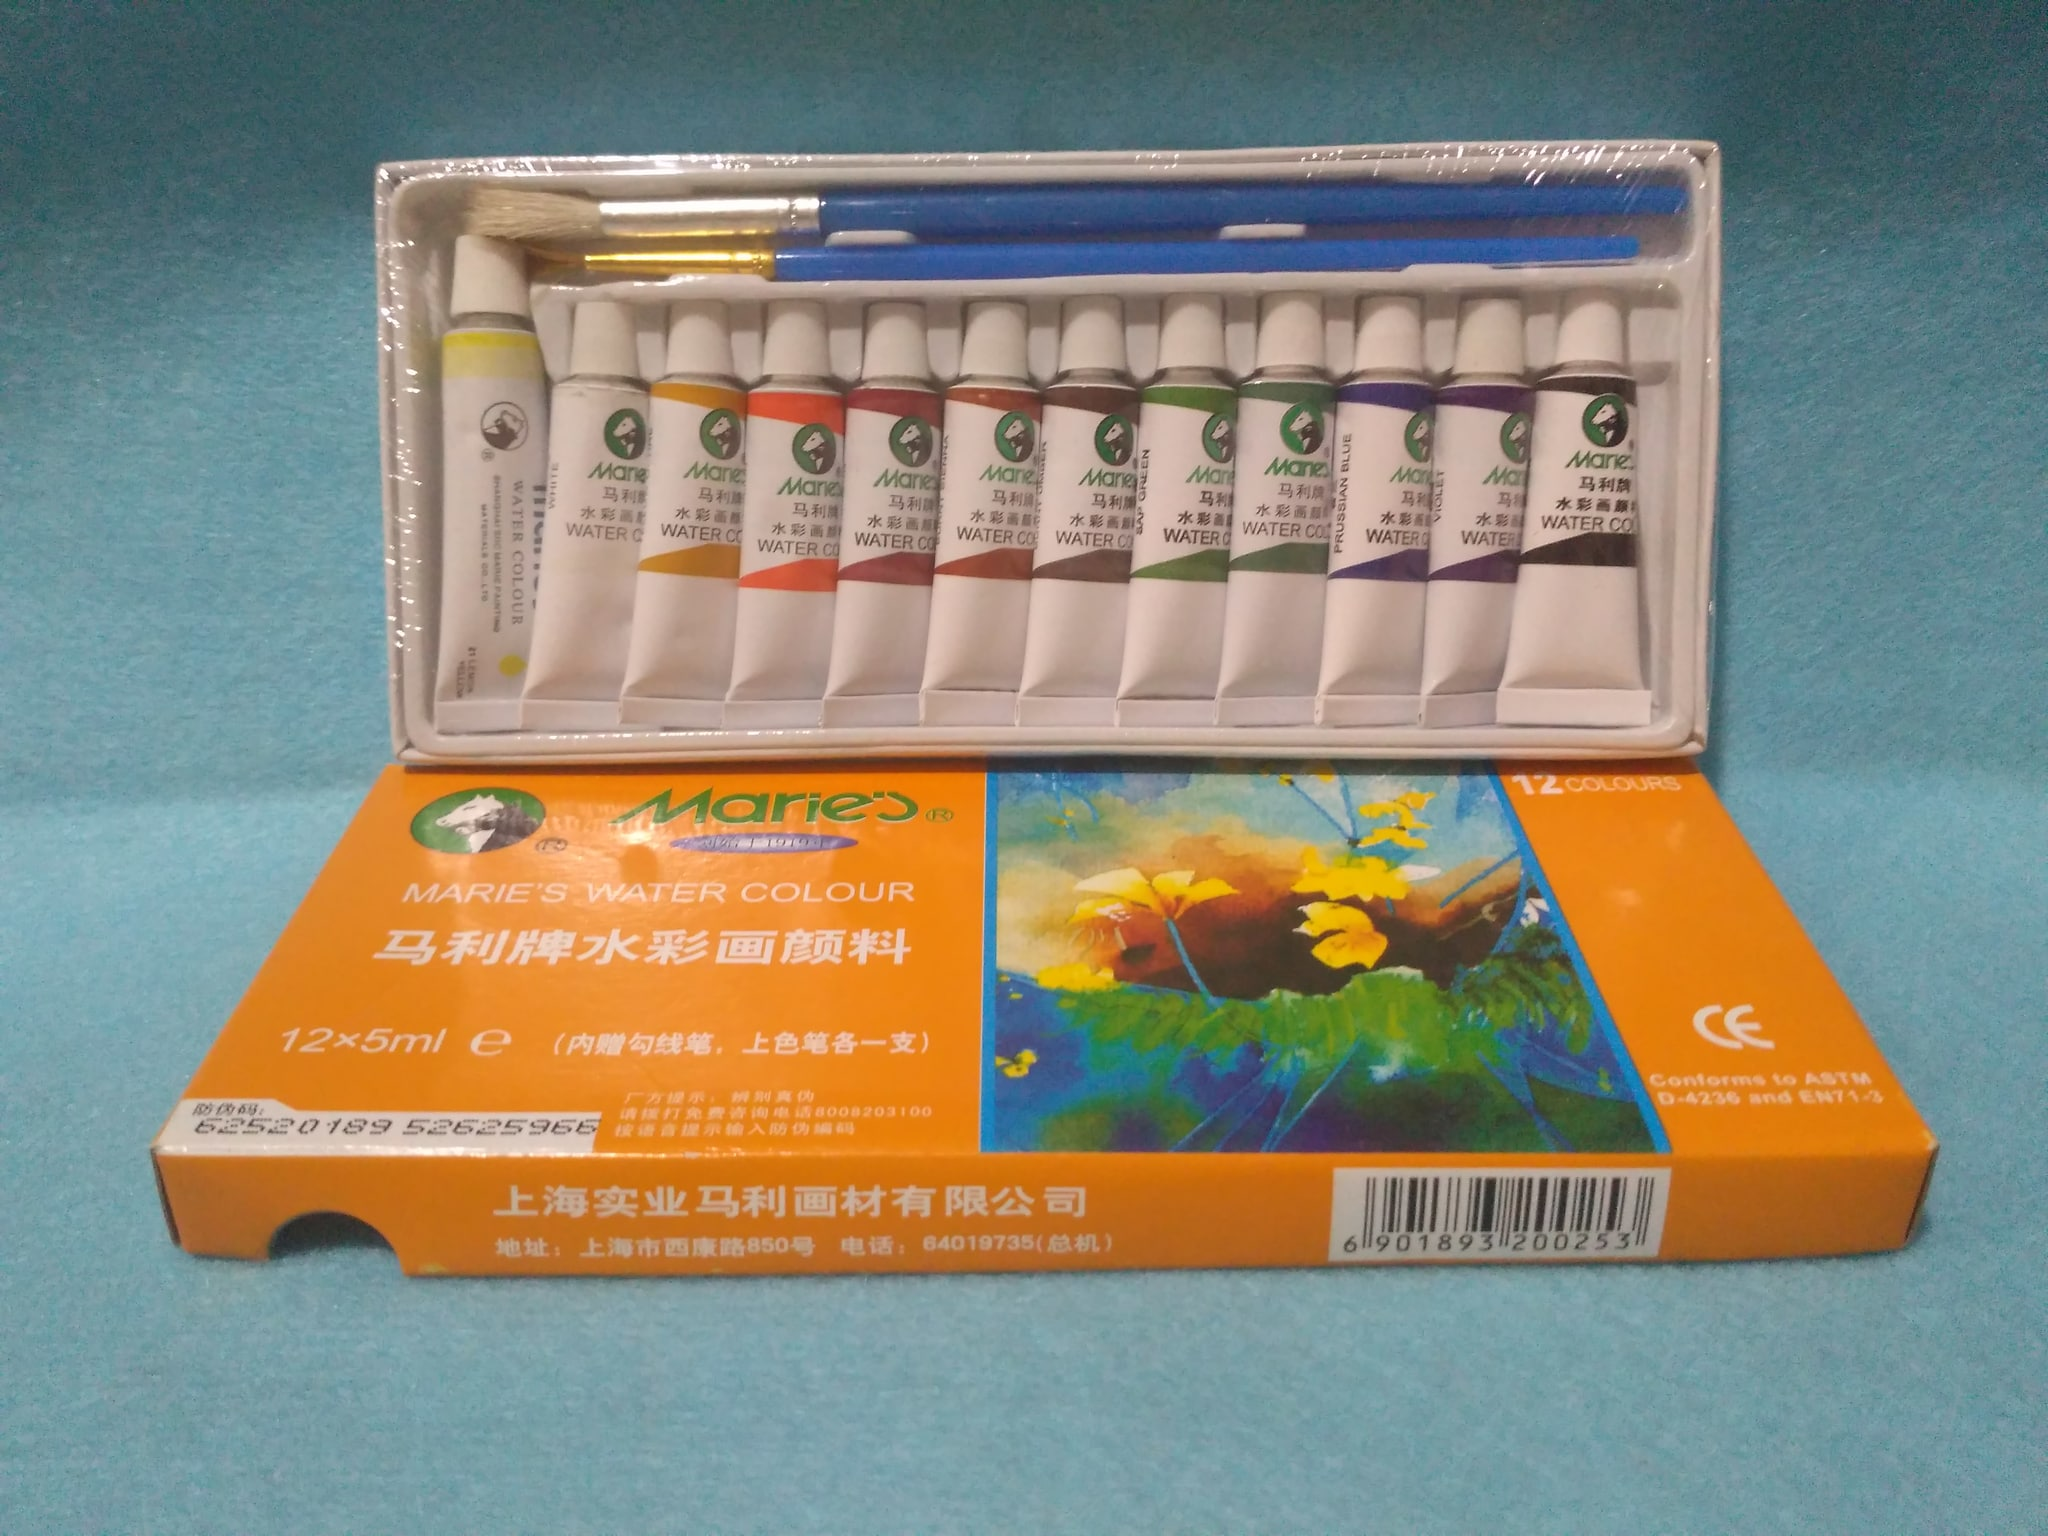 Cat Air Maries / Water Colours (5ml) . 1 Pak Isi 12 Warna